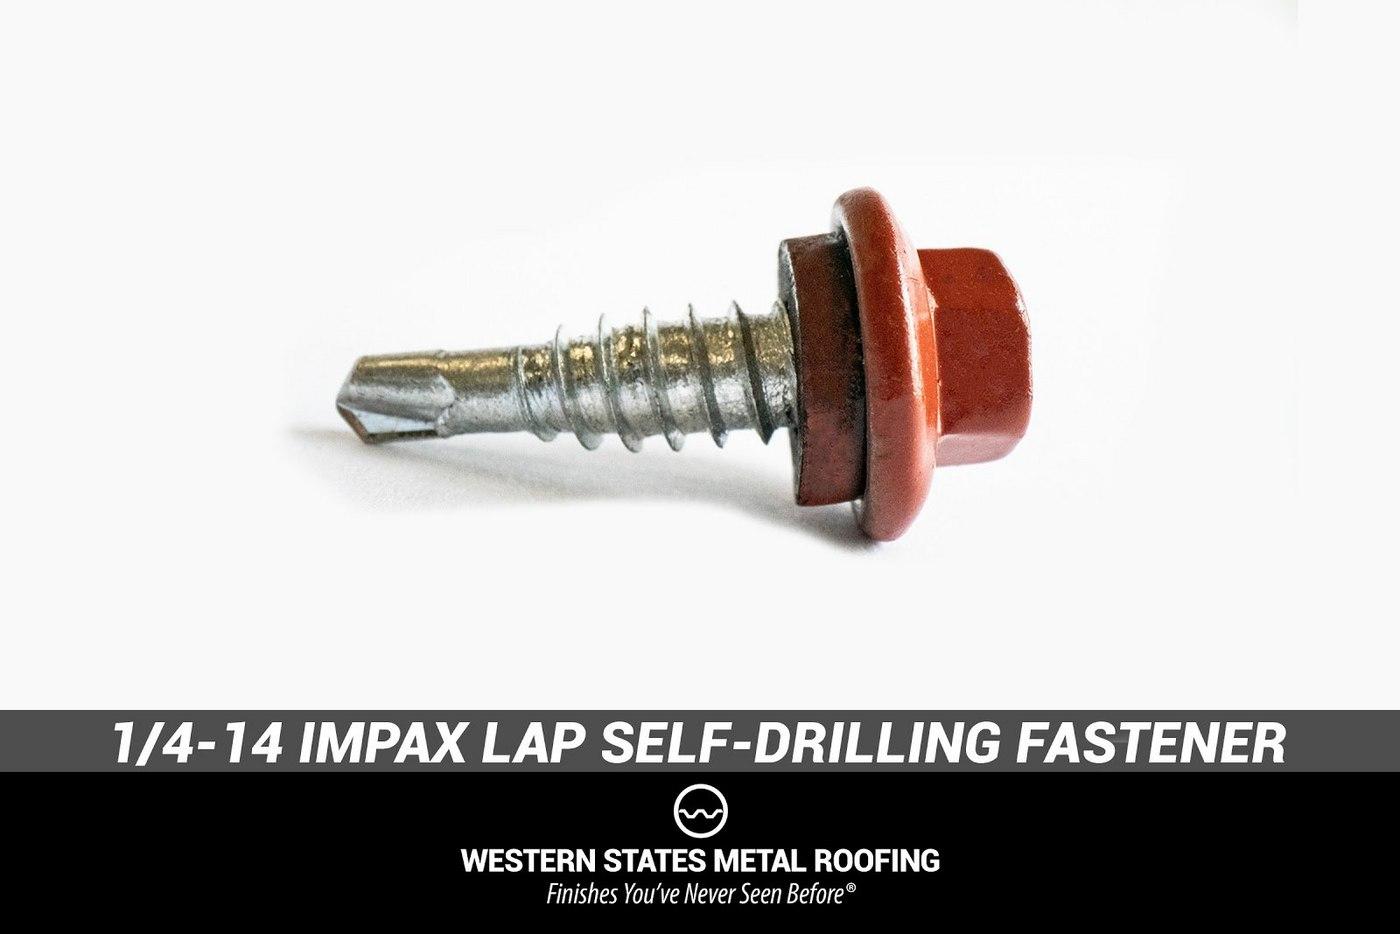 1/4-14 Impax Lap Self-Drilling Fastener